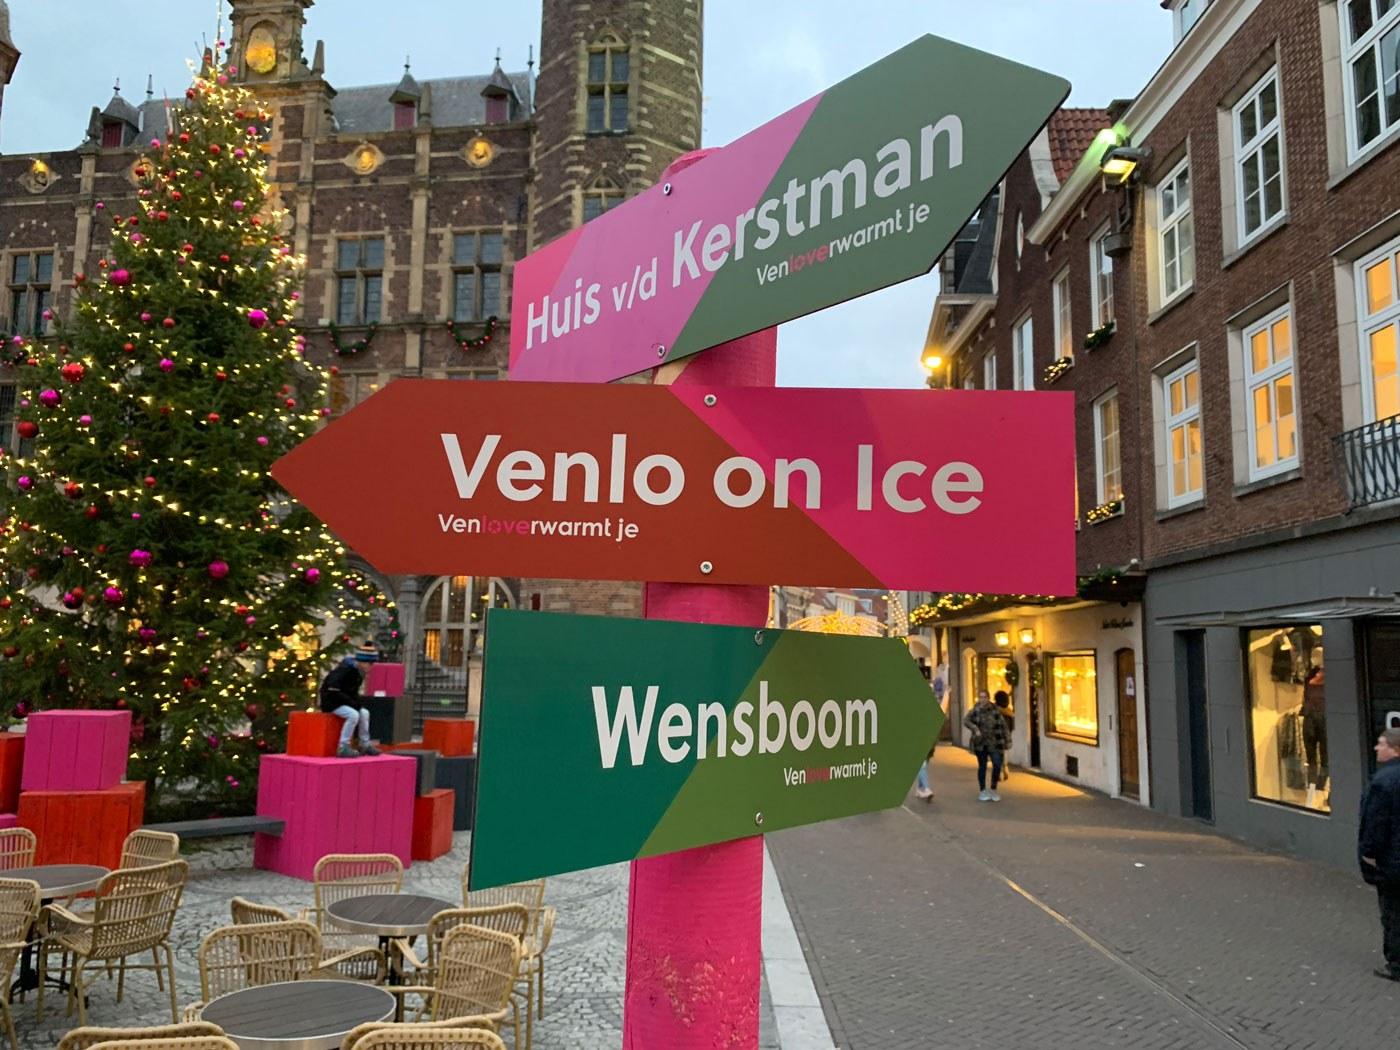 Datum Venlo on Ice 2019/2020 bekend!